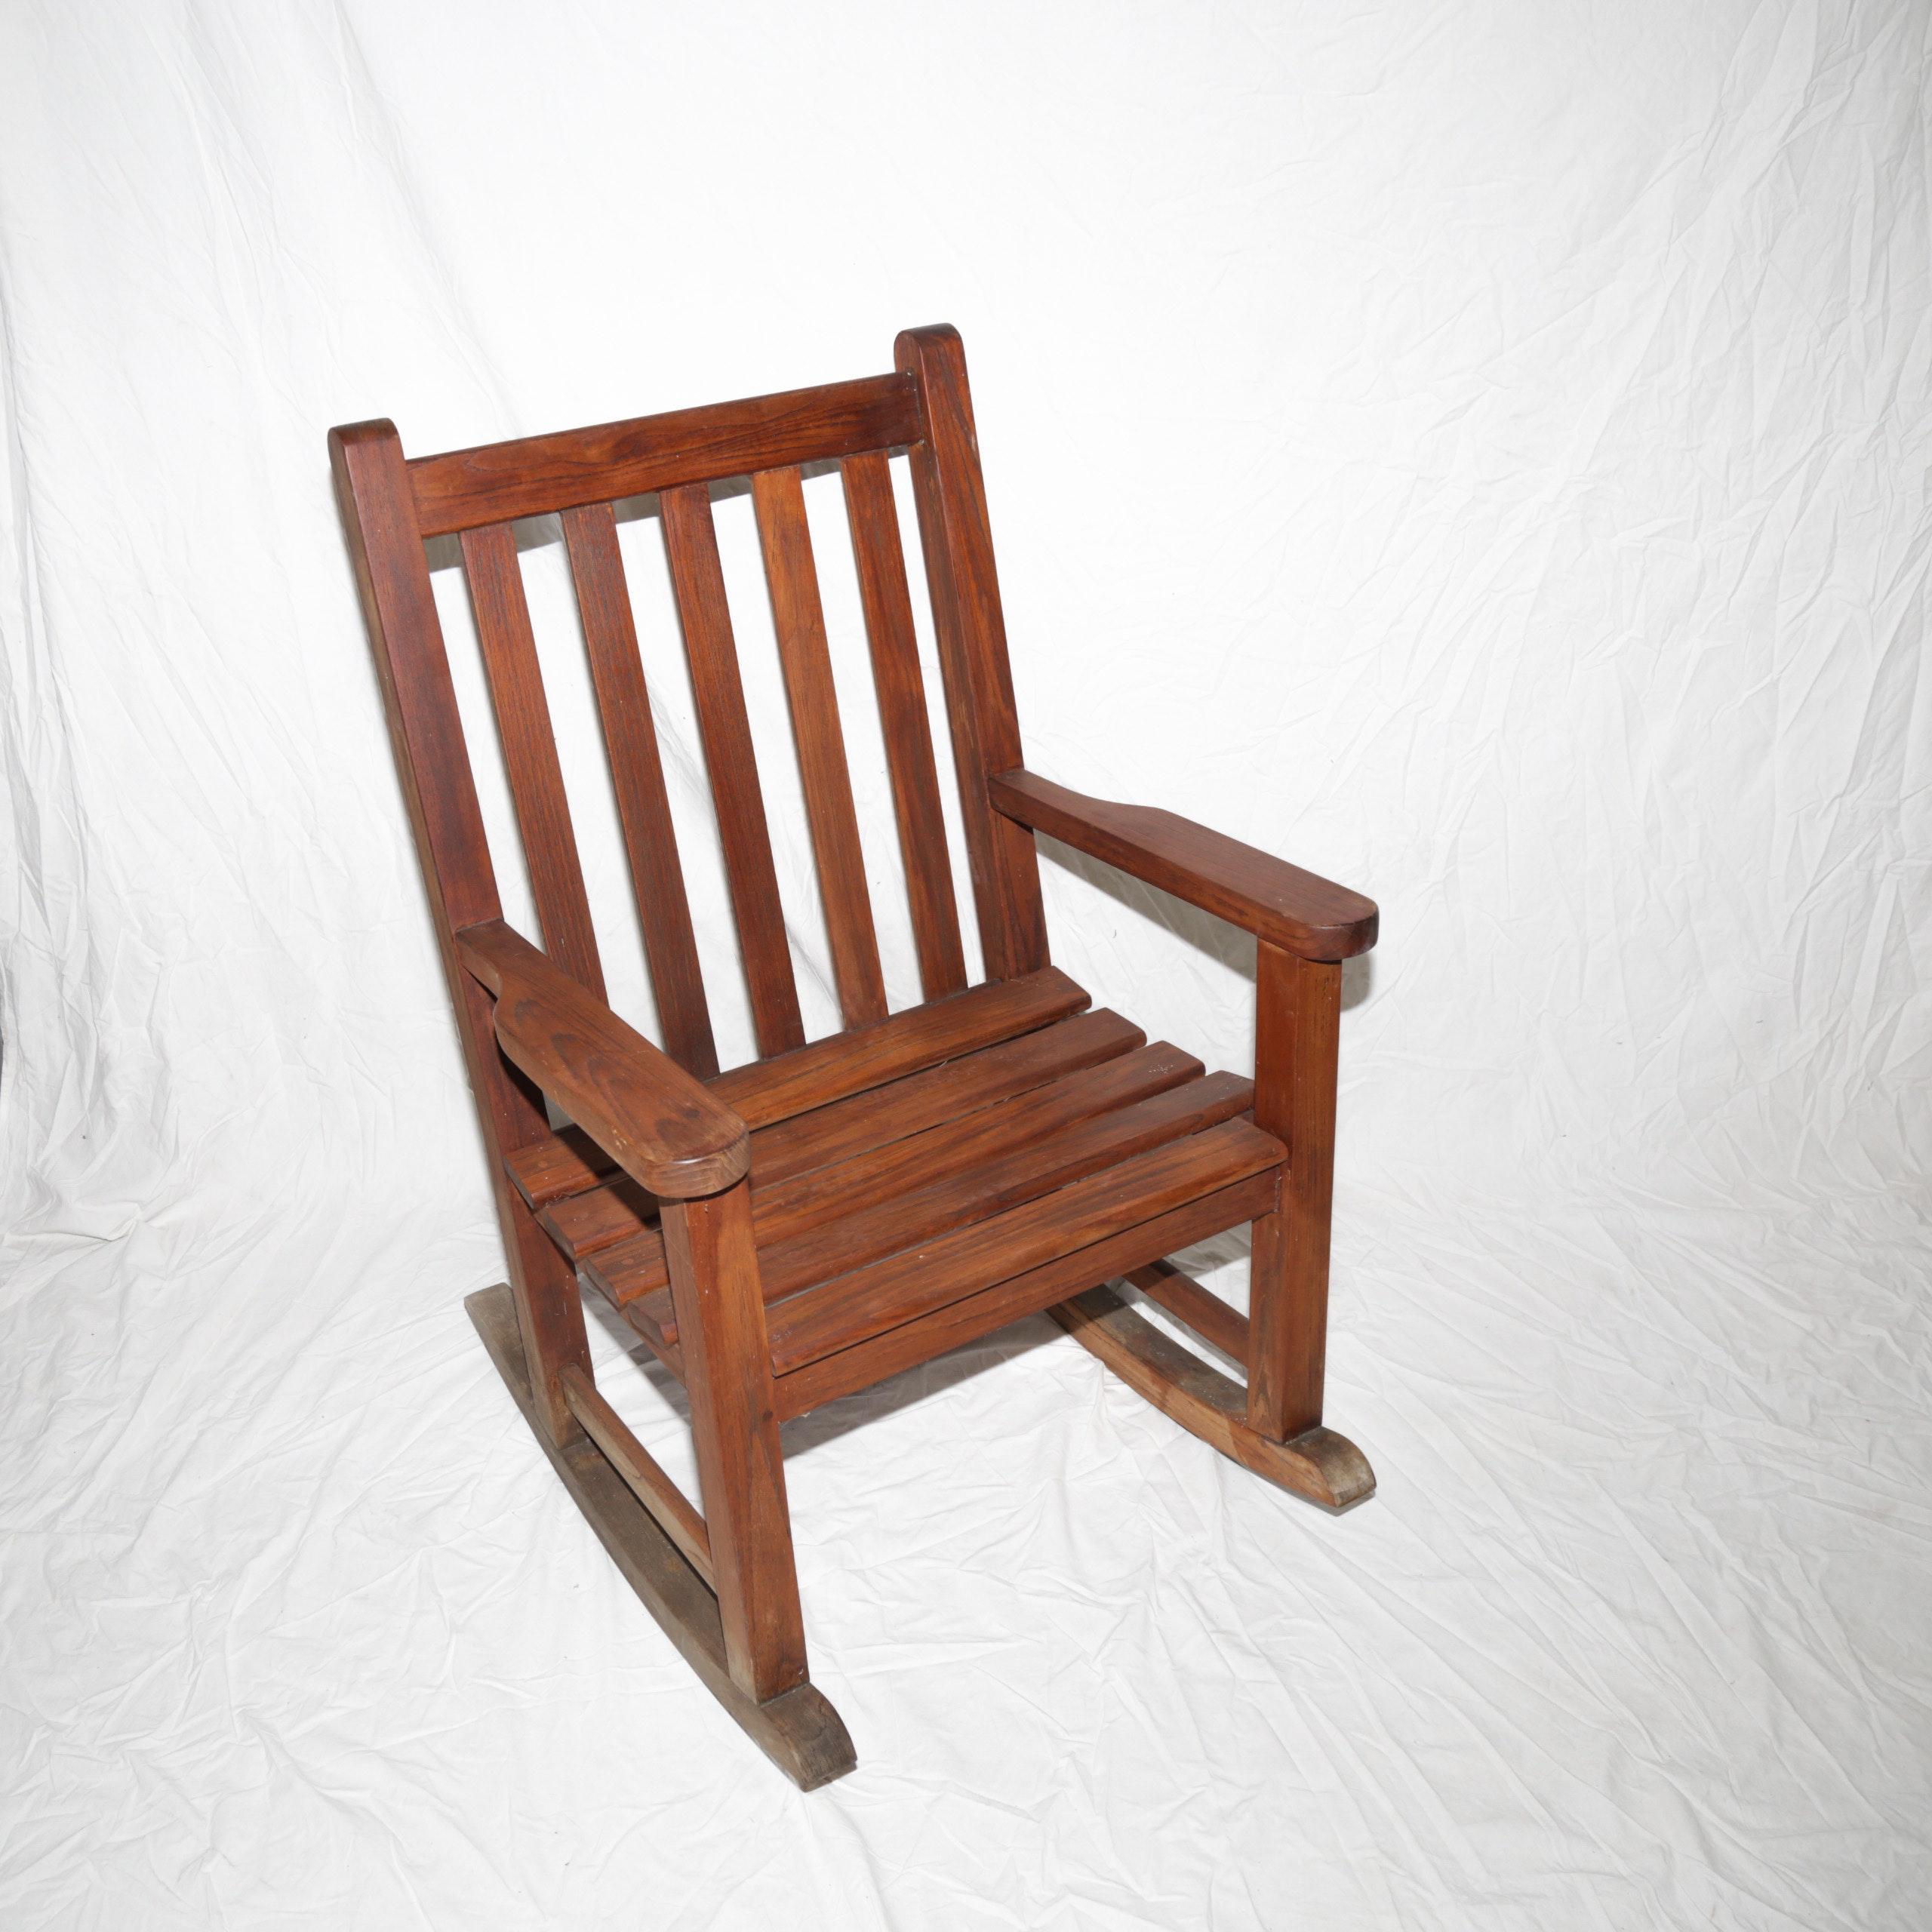 Wood Classics Inc. Outdoor Teak Rocking Chair